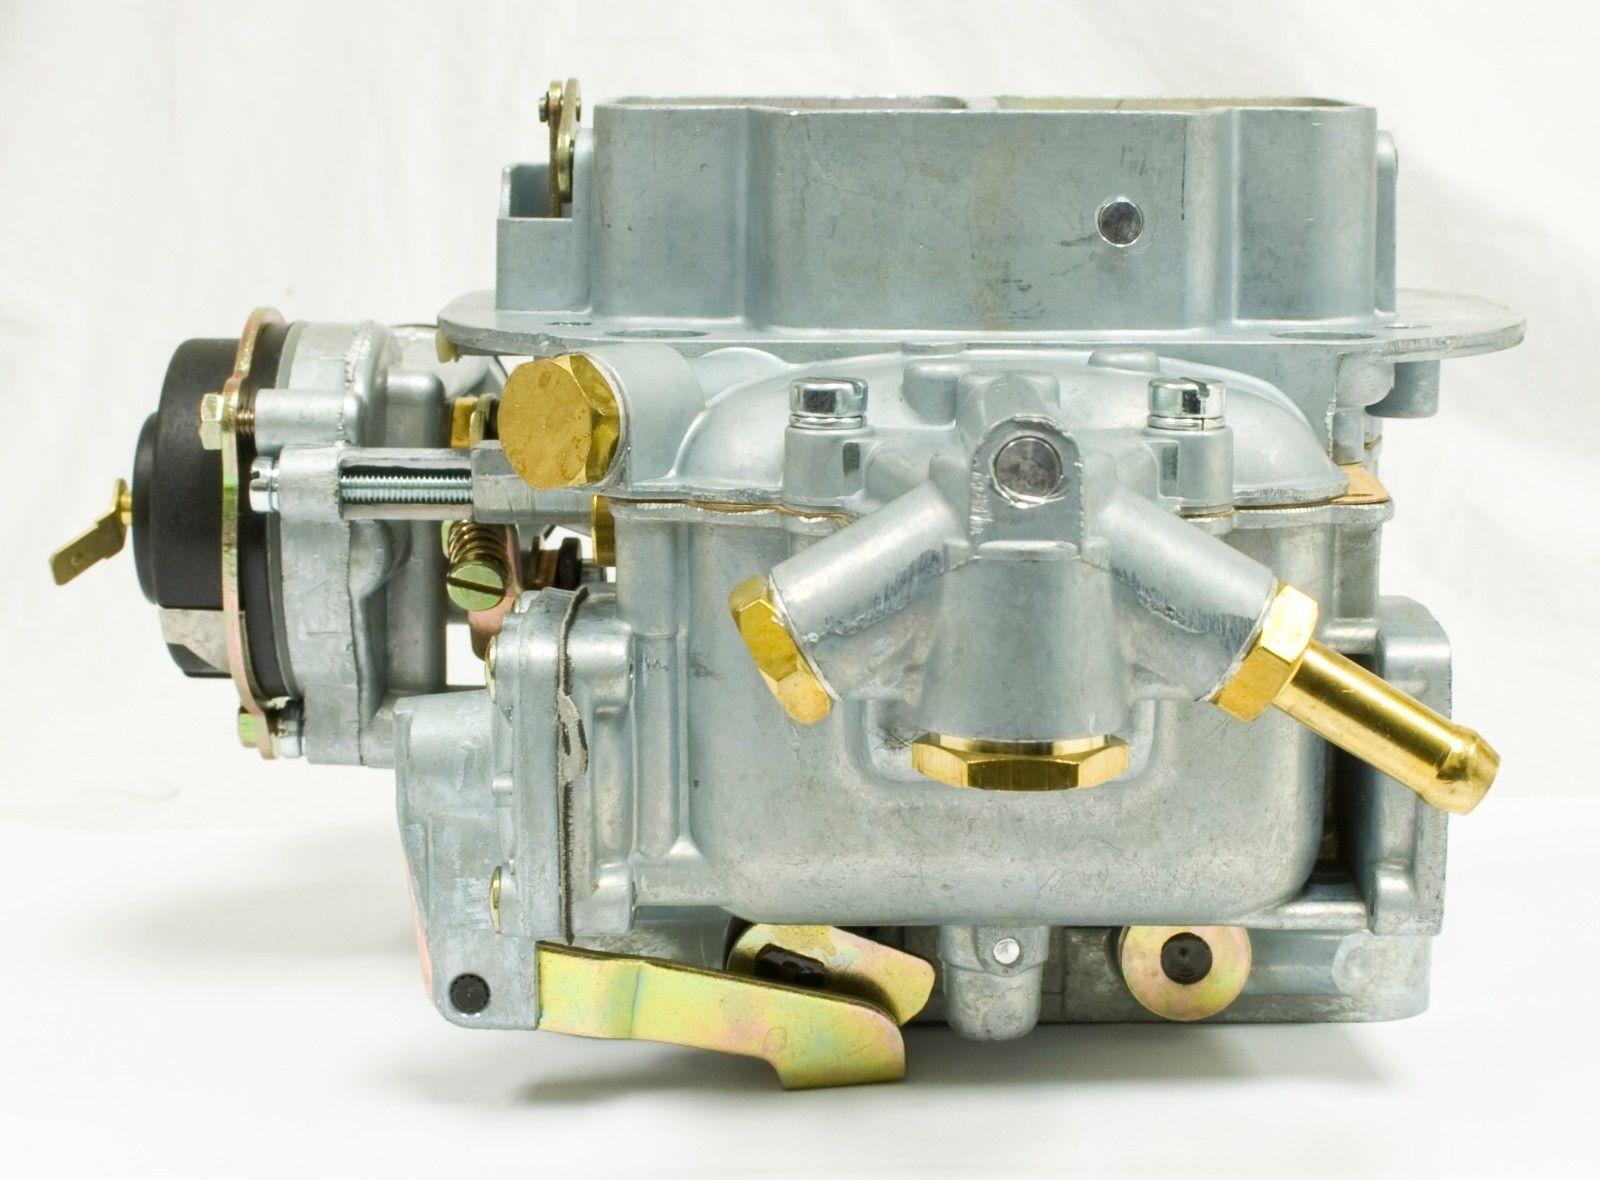 FITS JEEP 72-78 CJ EMPI 32/36E CARB KIT - 258ci 6 Cyl 4 2L